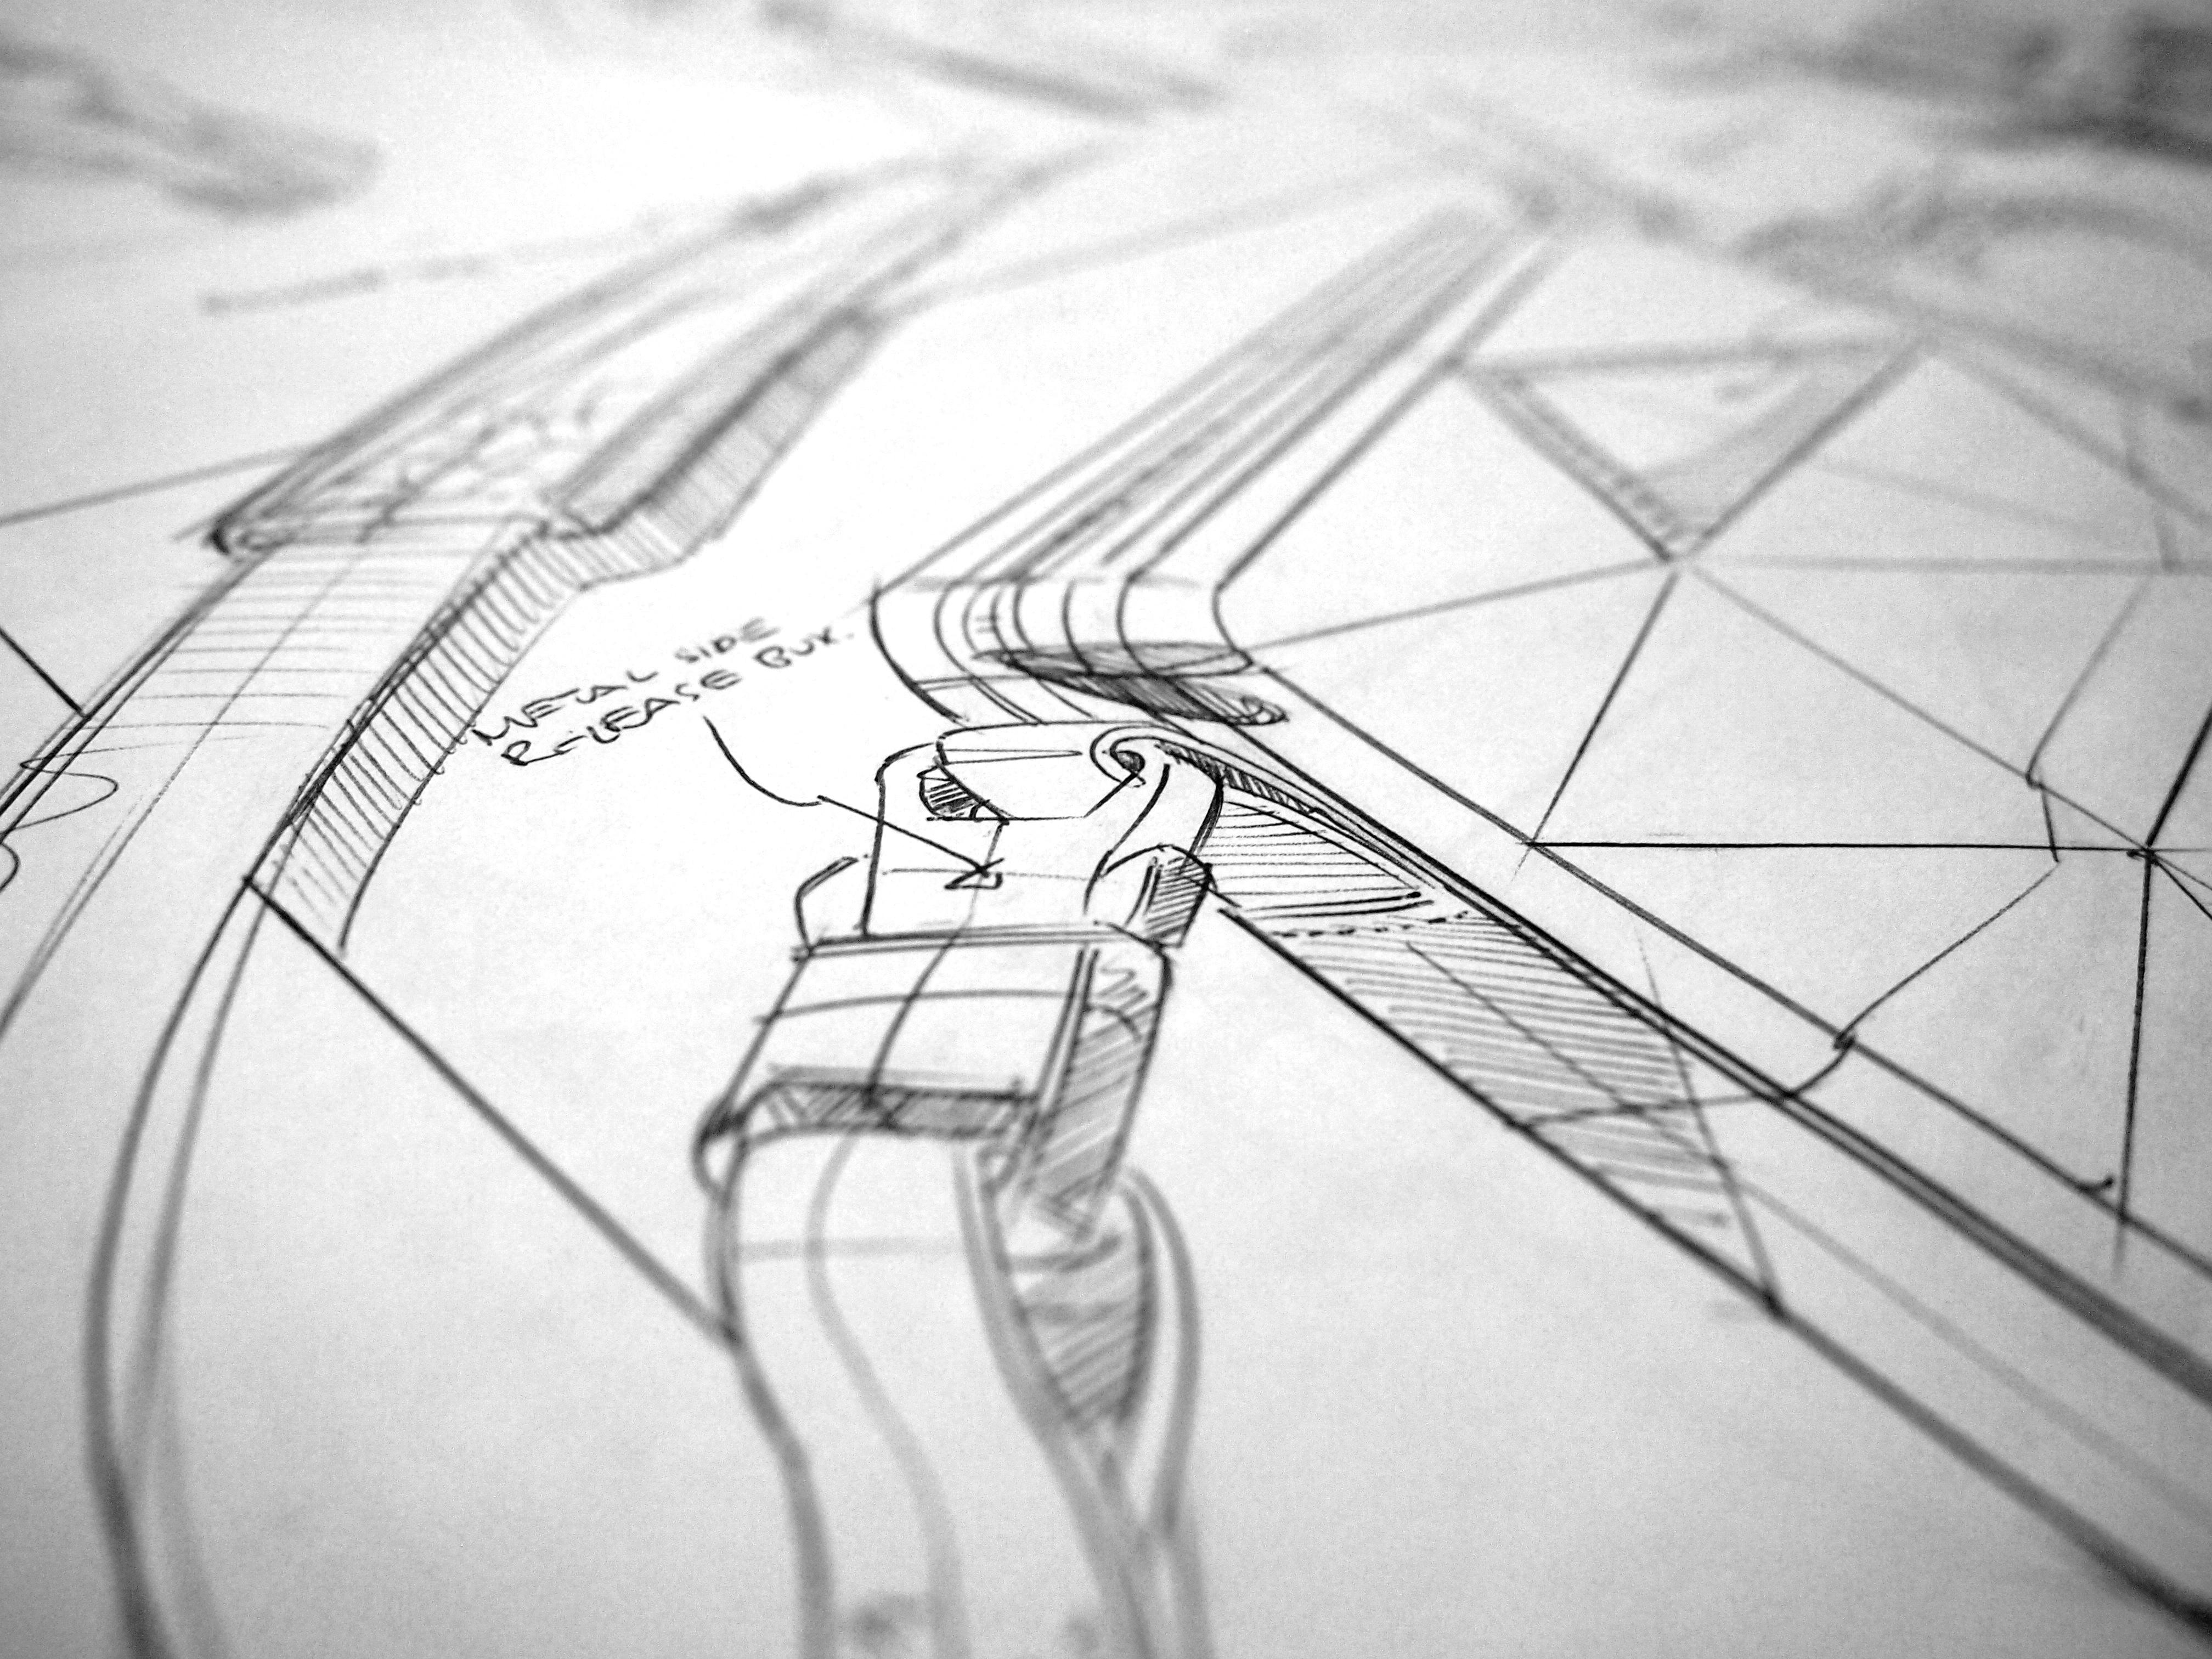 Paper bag sketch - Detail From Previous Bag Sketch Ballpoint Laser Printer Paper